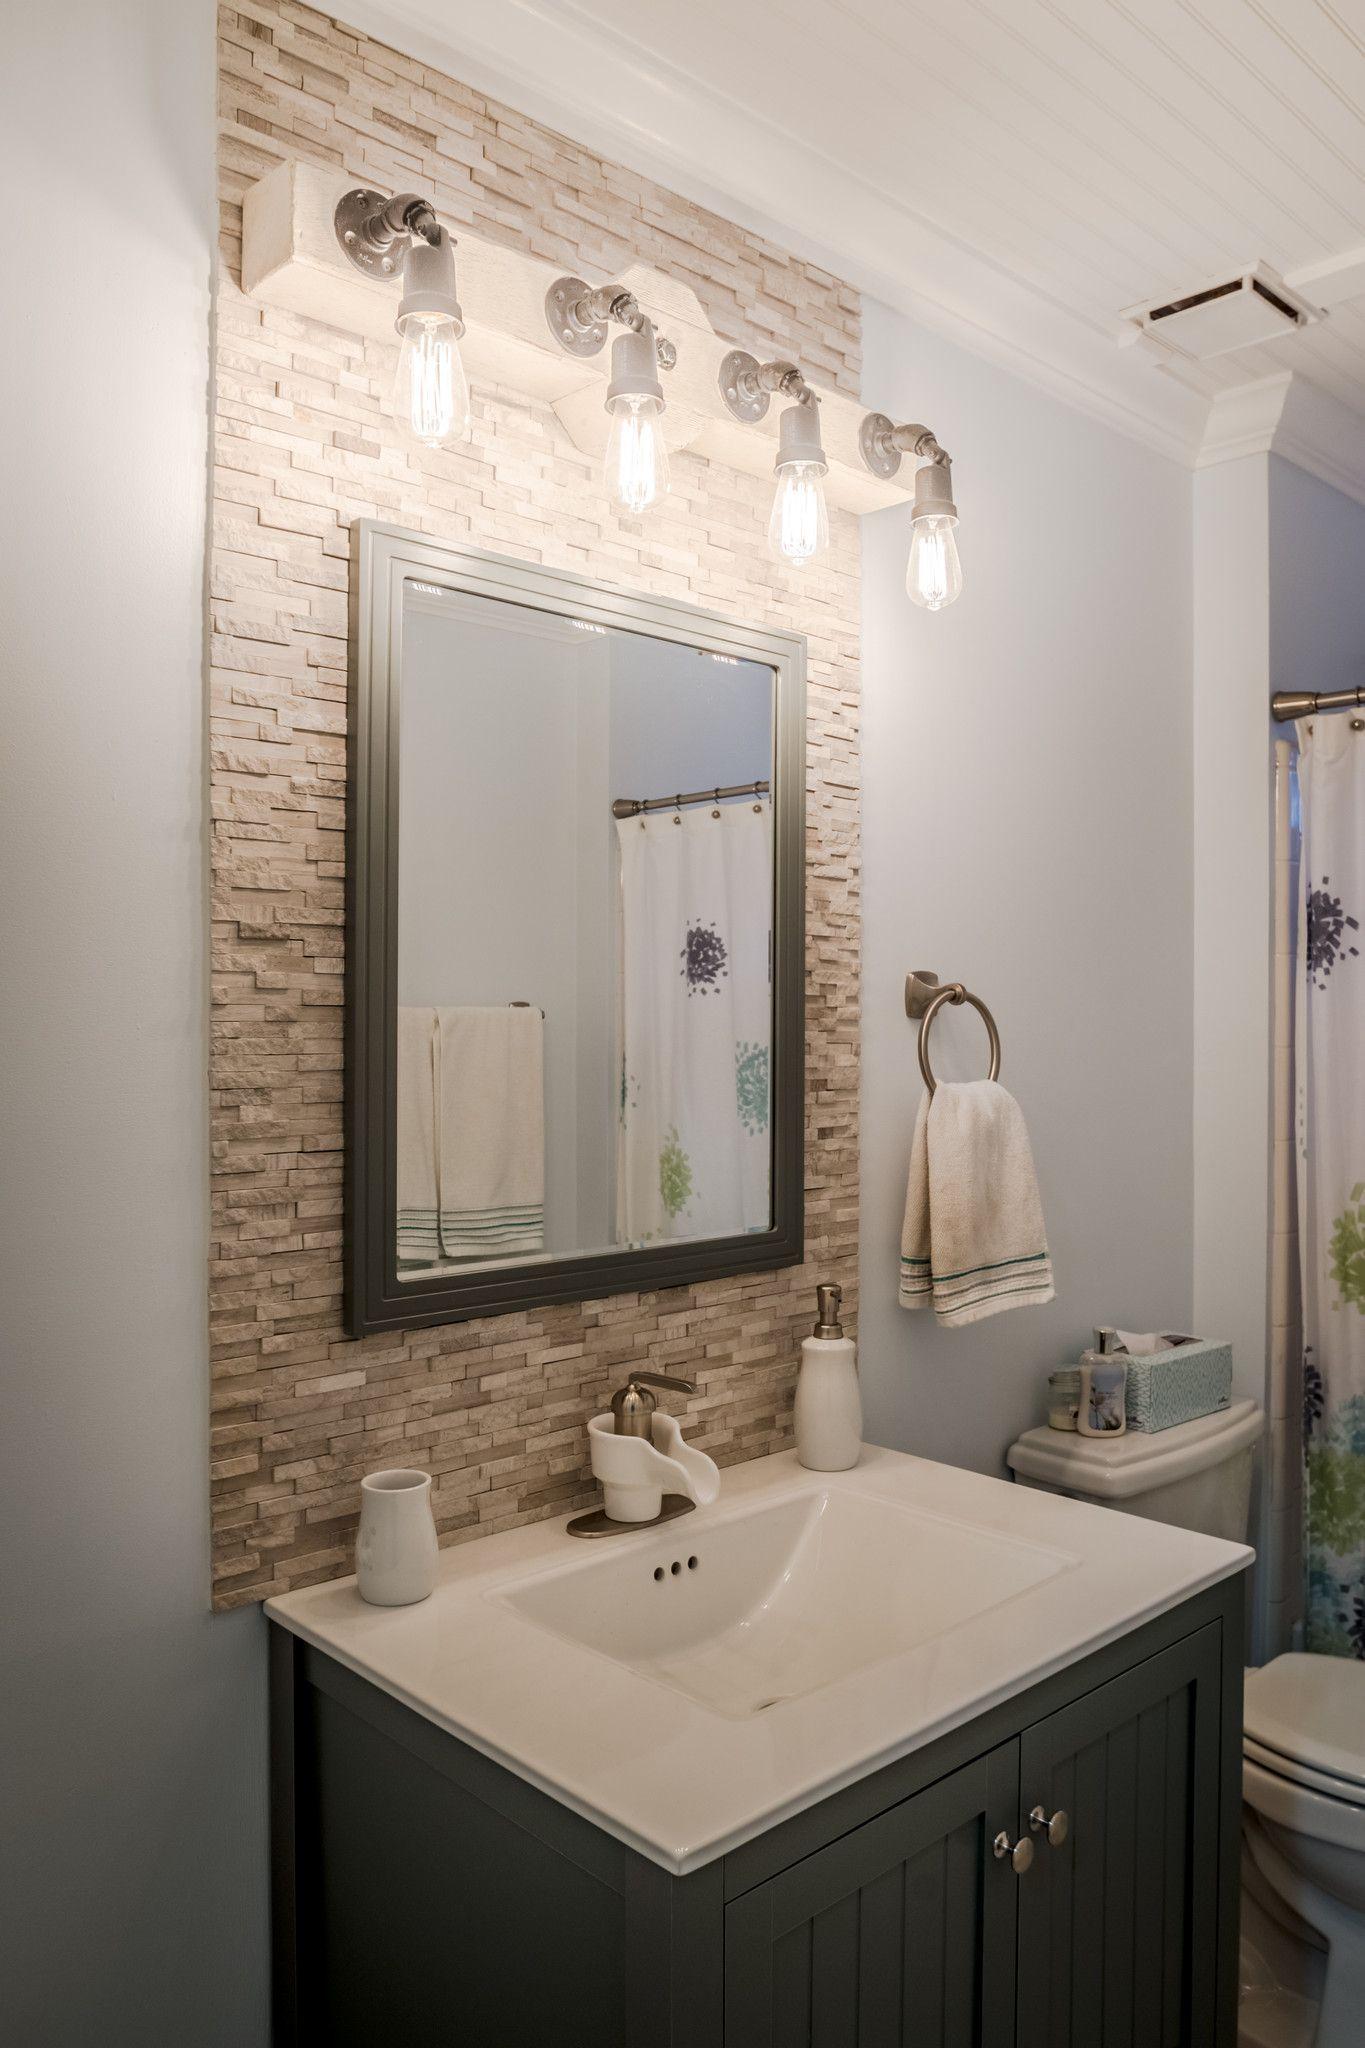 7 Interesting Bathroom Backsplash Ideas Design Ideas To Inspire You